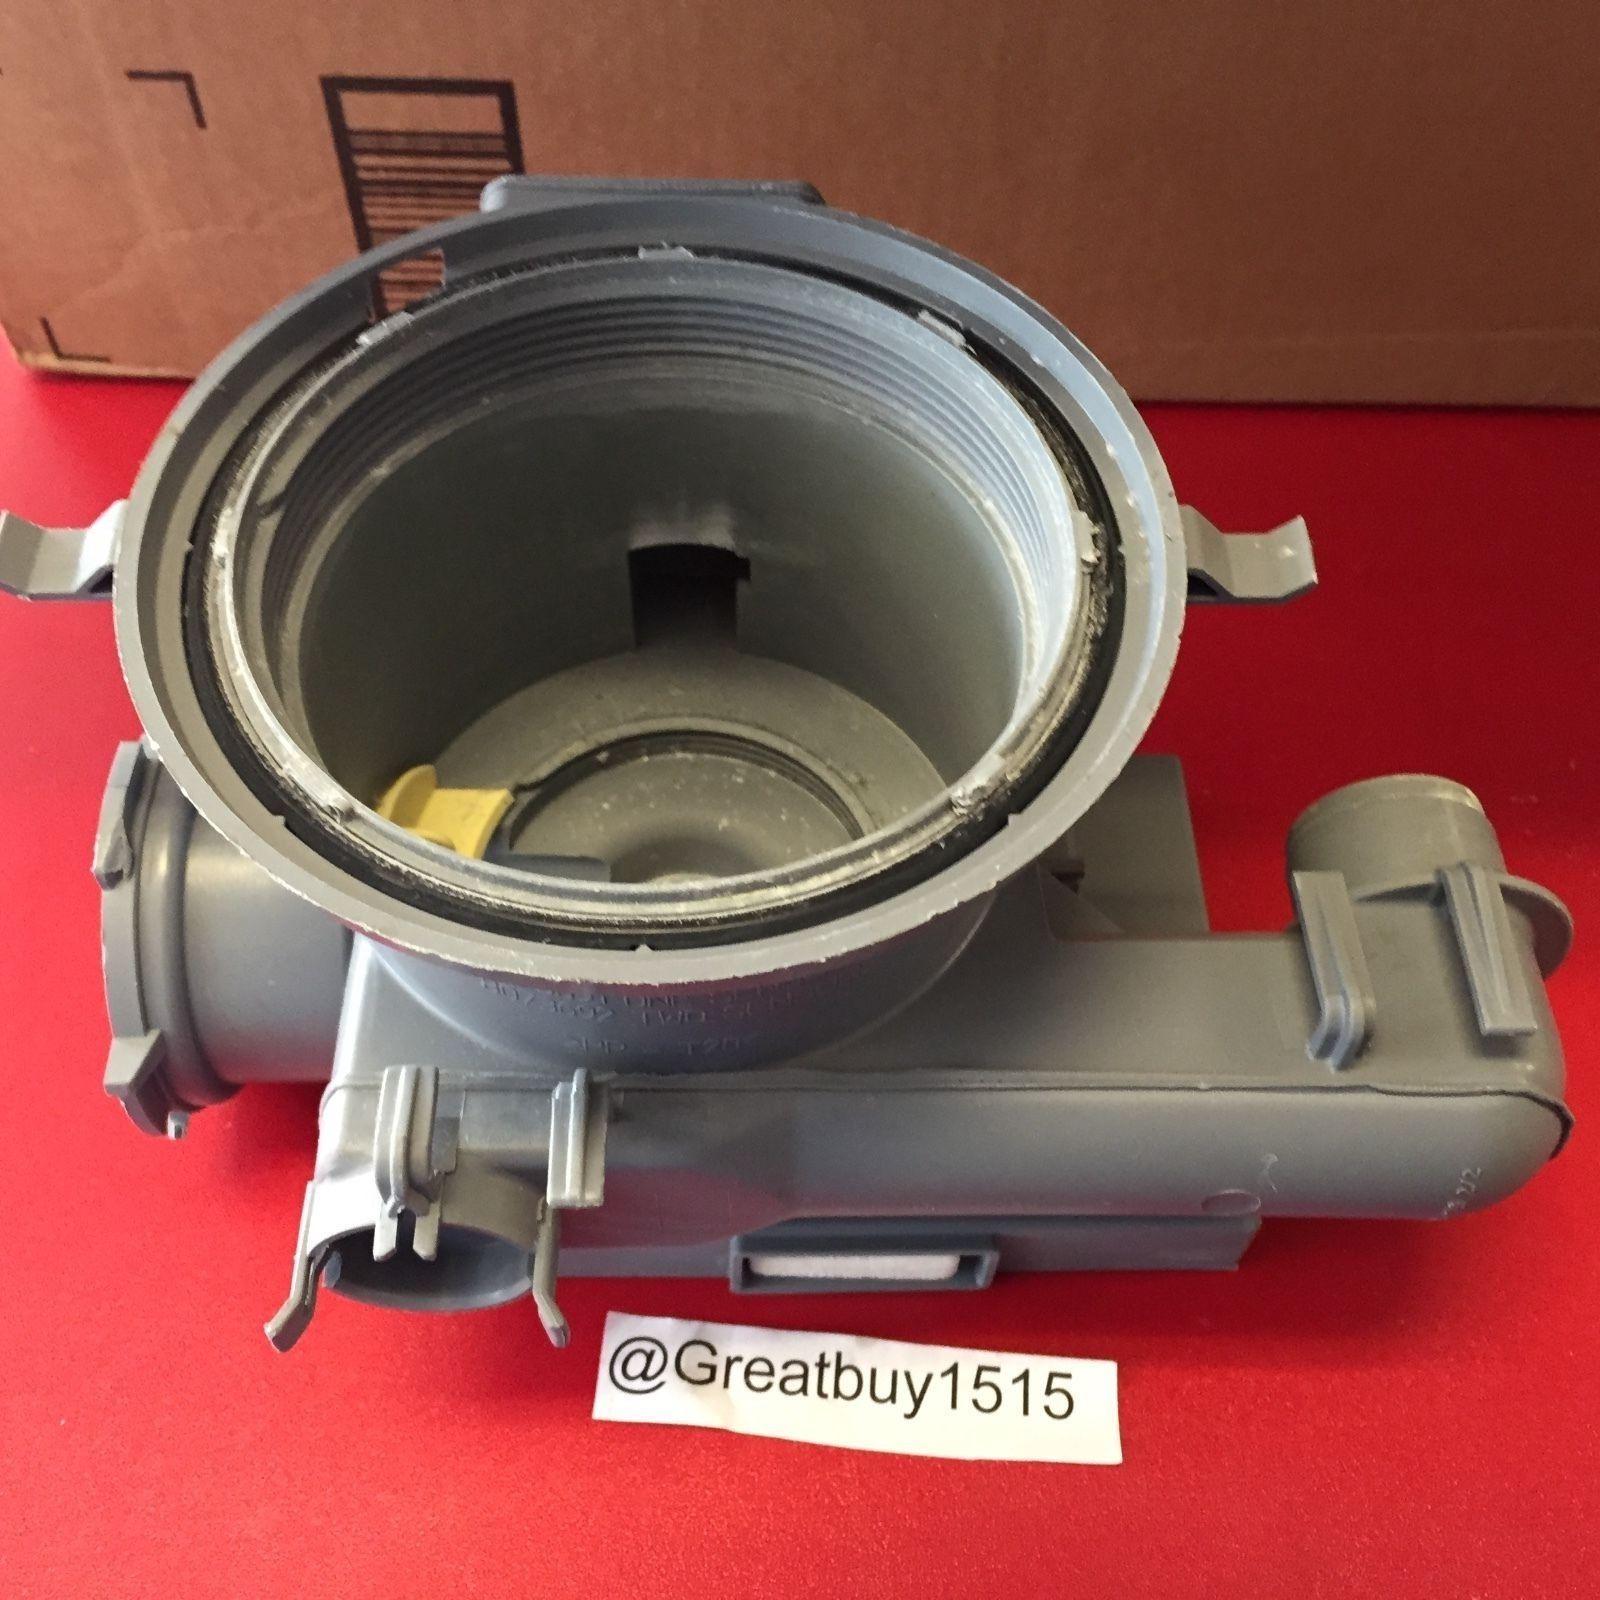 Asko Dishwasher Model D3251 Parts Temp and 15 similar items